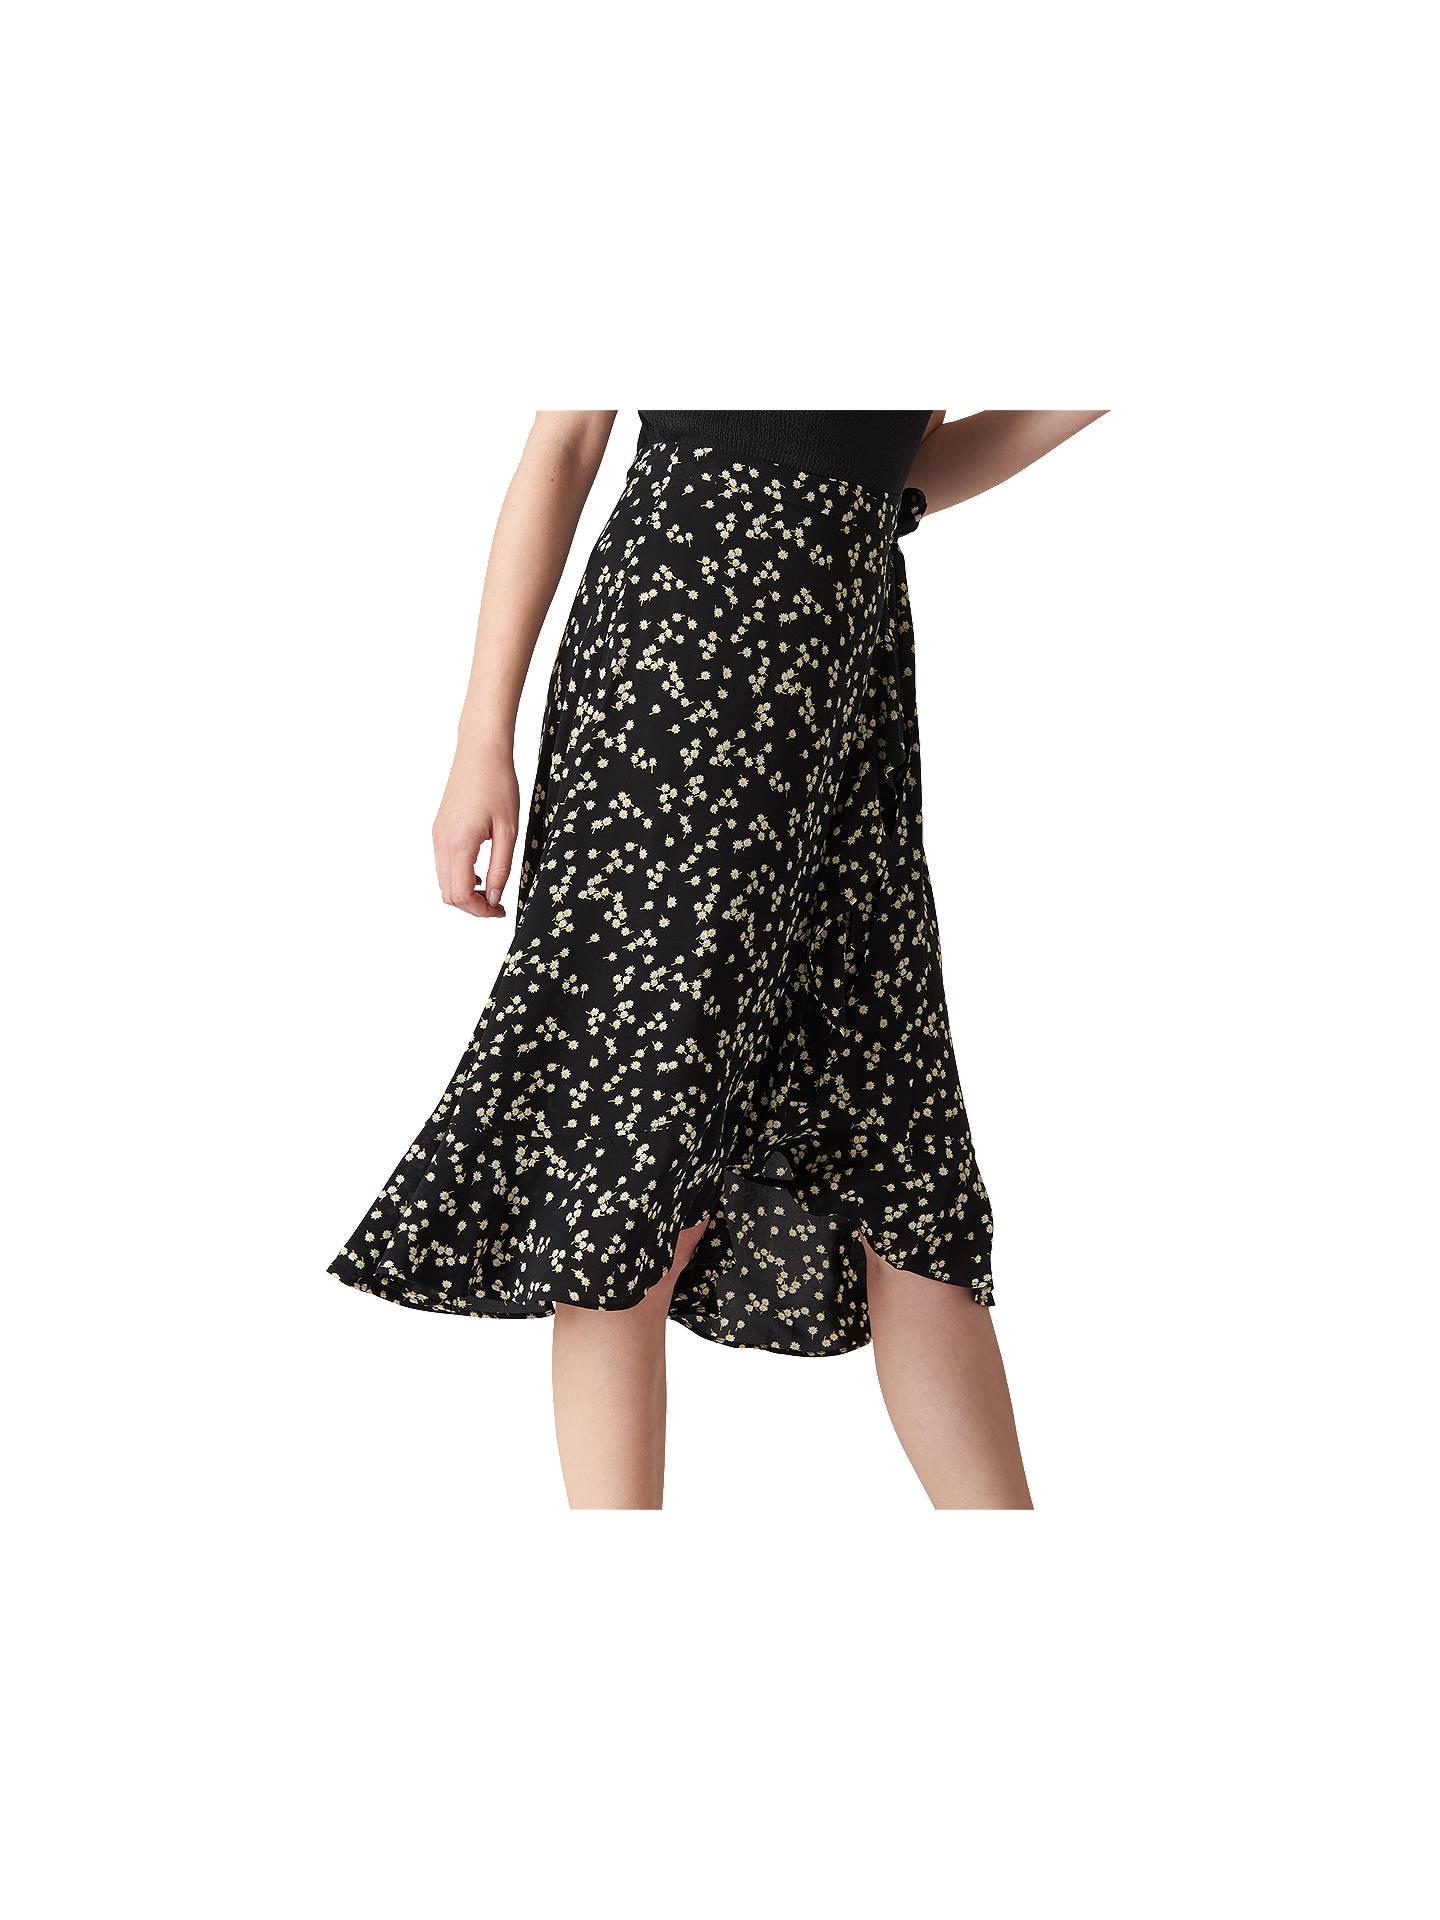 3cd5010888 BuyWhistles Daisy Print Frill Wrap Skirt